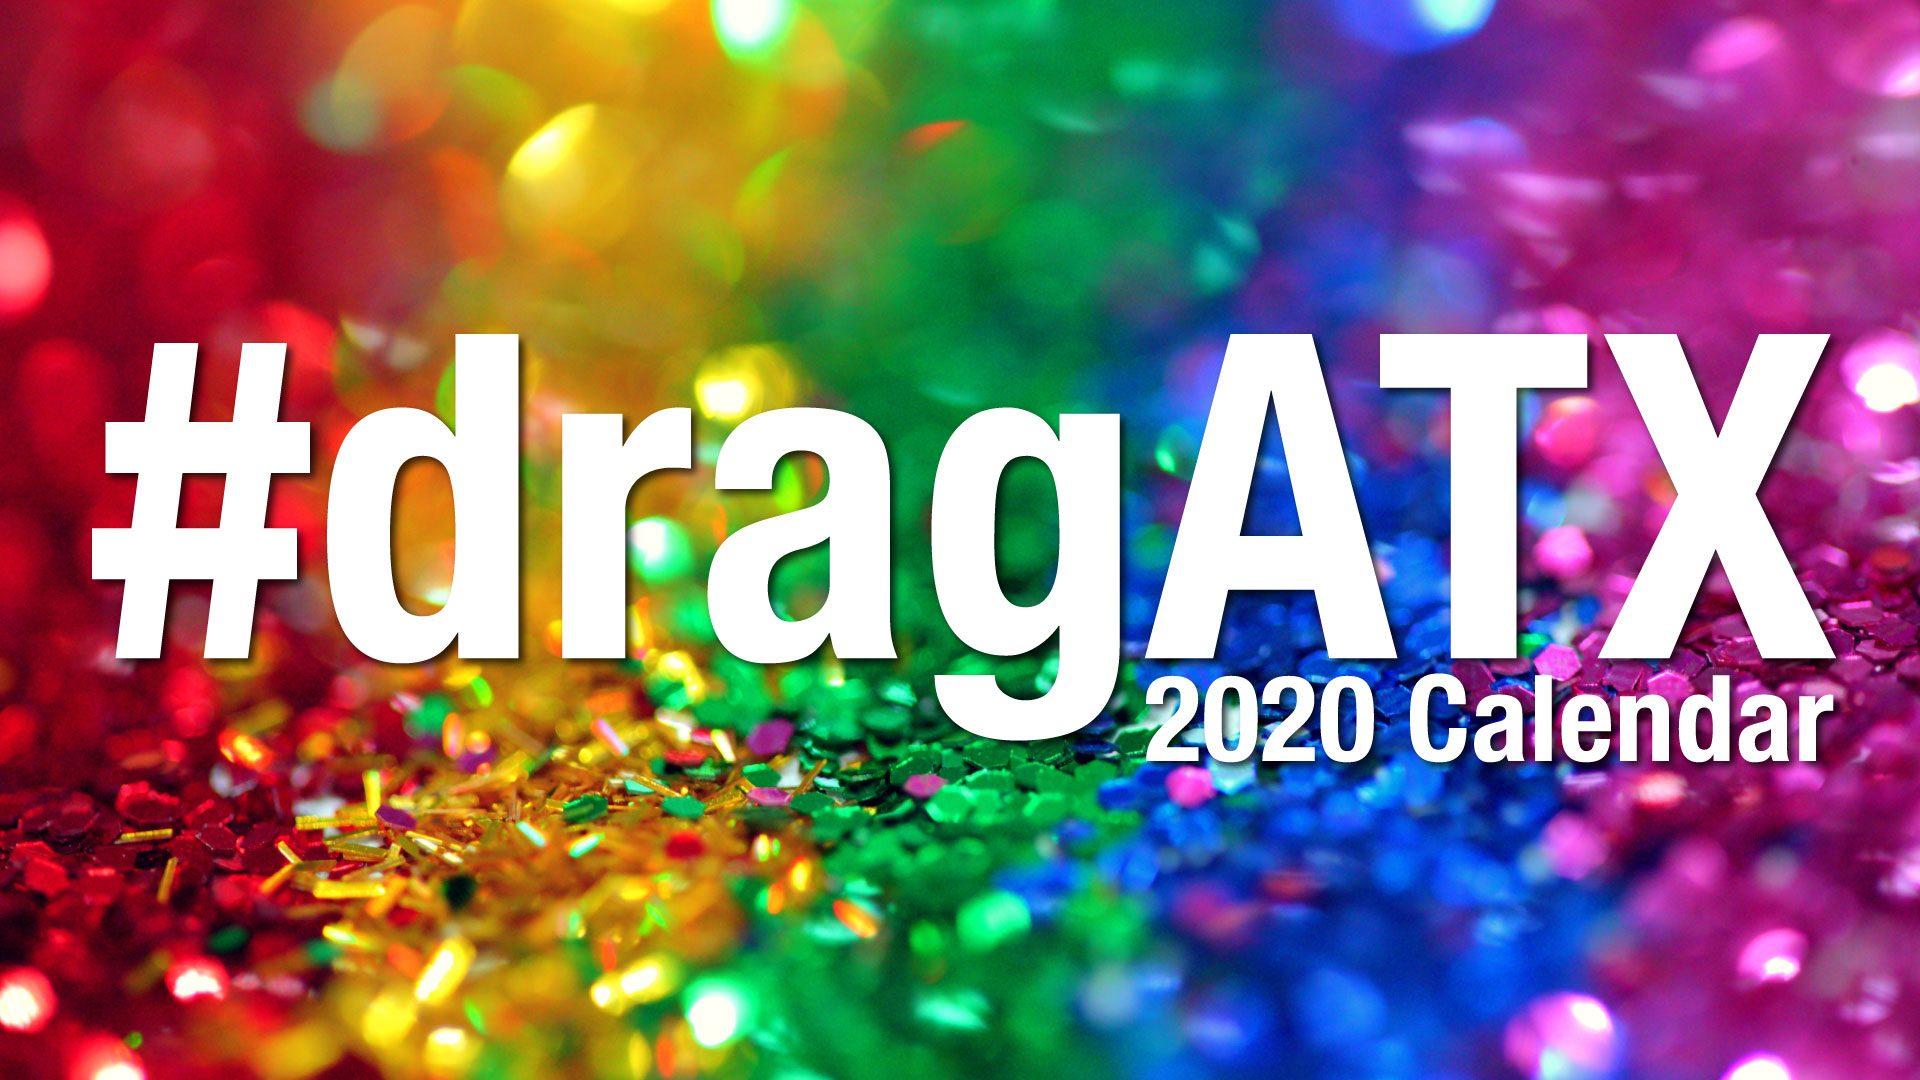 #dragatx 2020 Calendar  Therepubliq for Barr Beacon Calendar